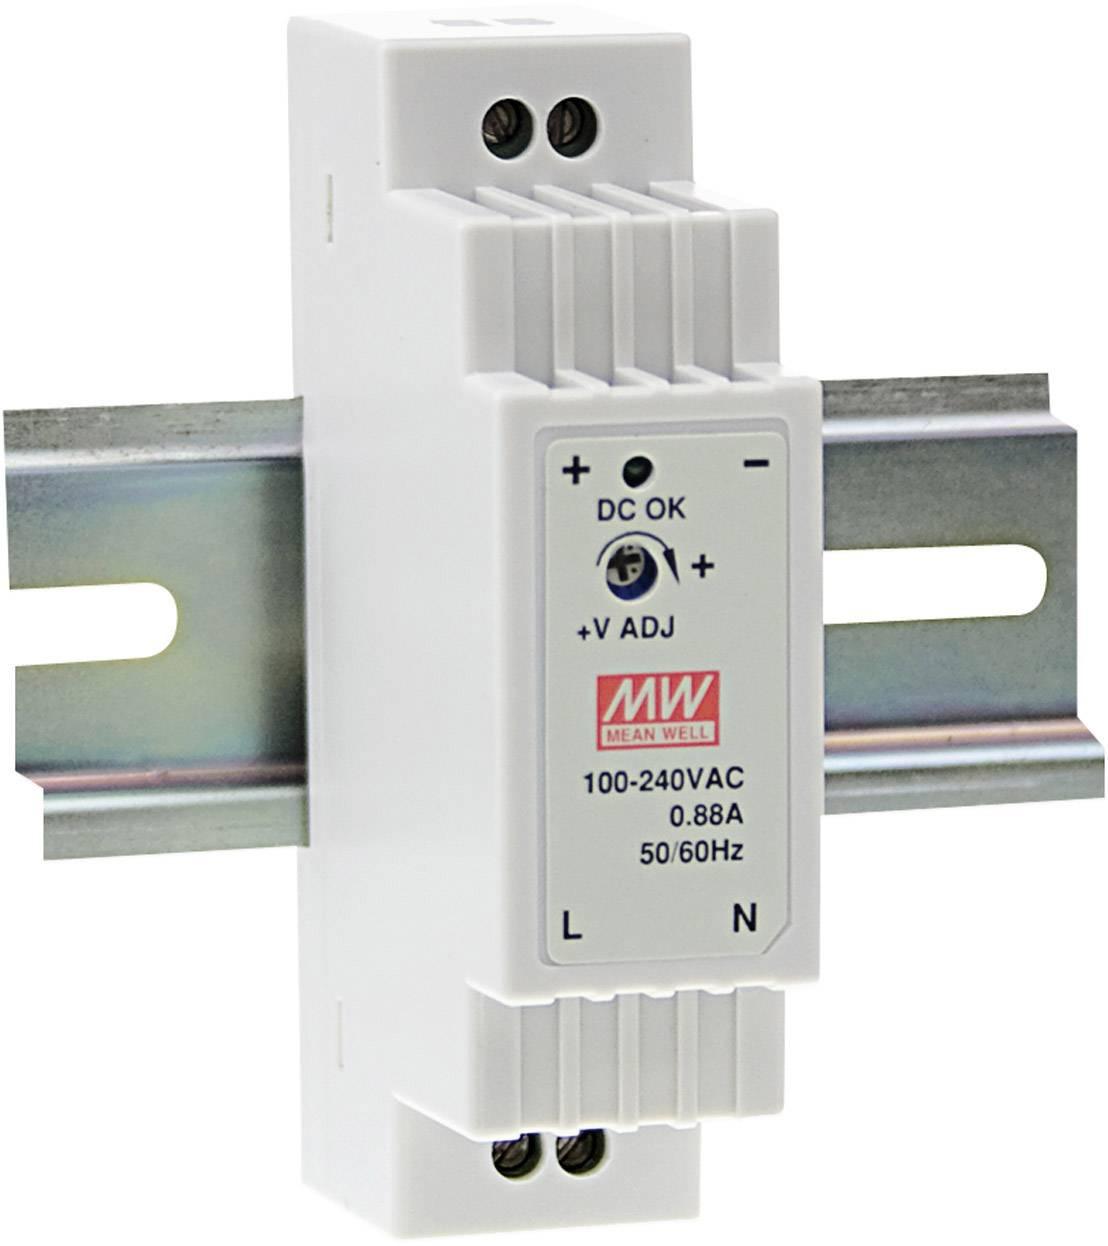 Meanwell HDR-15-12 12V DC 1,24A 15W Hutschienen Netzteil SNT